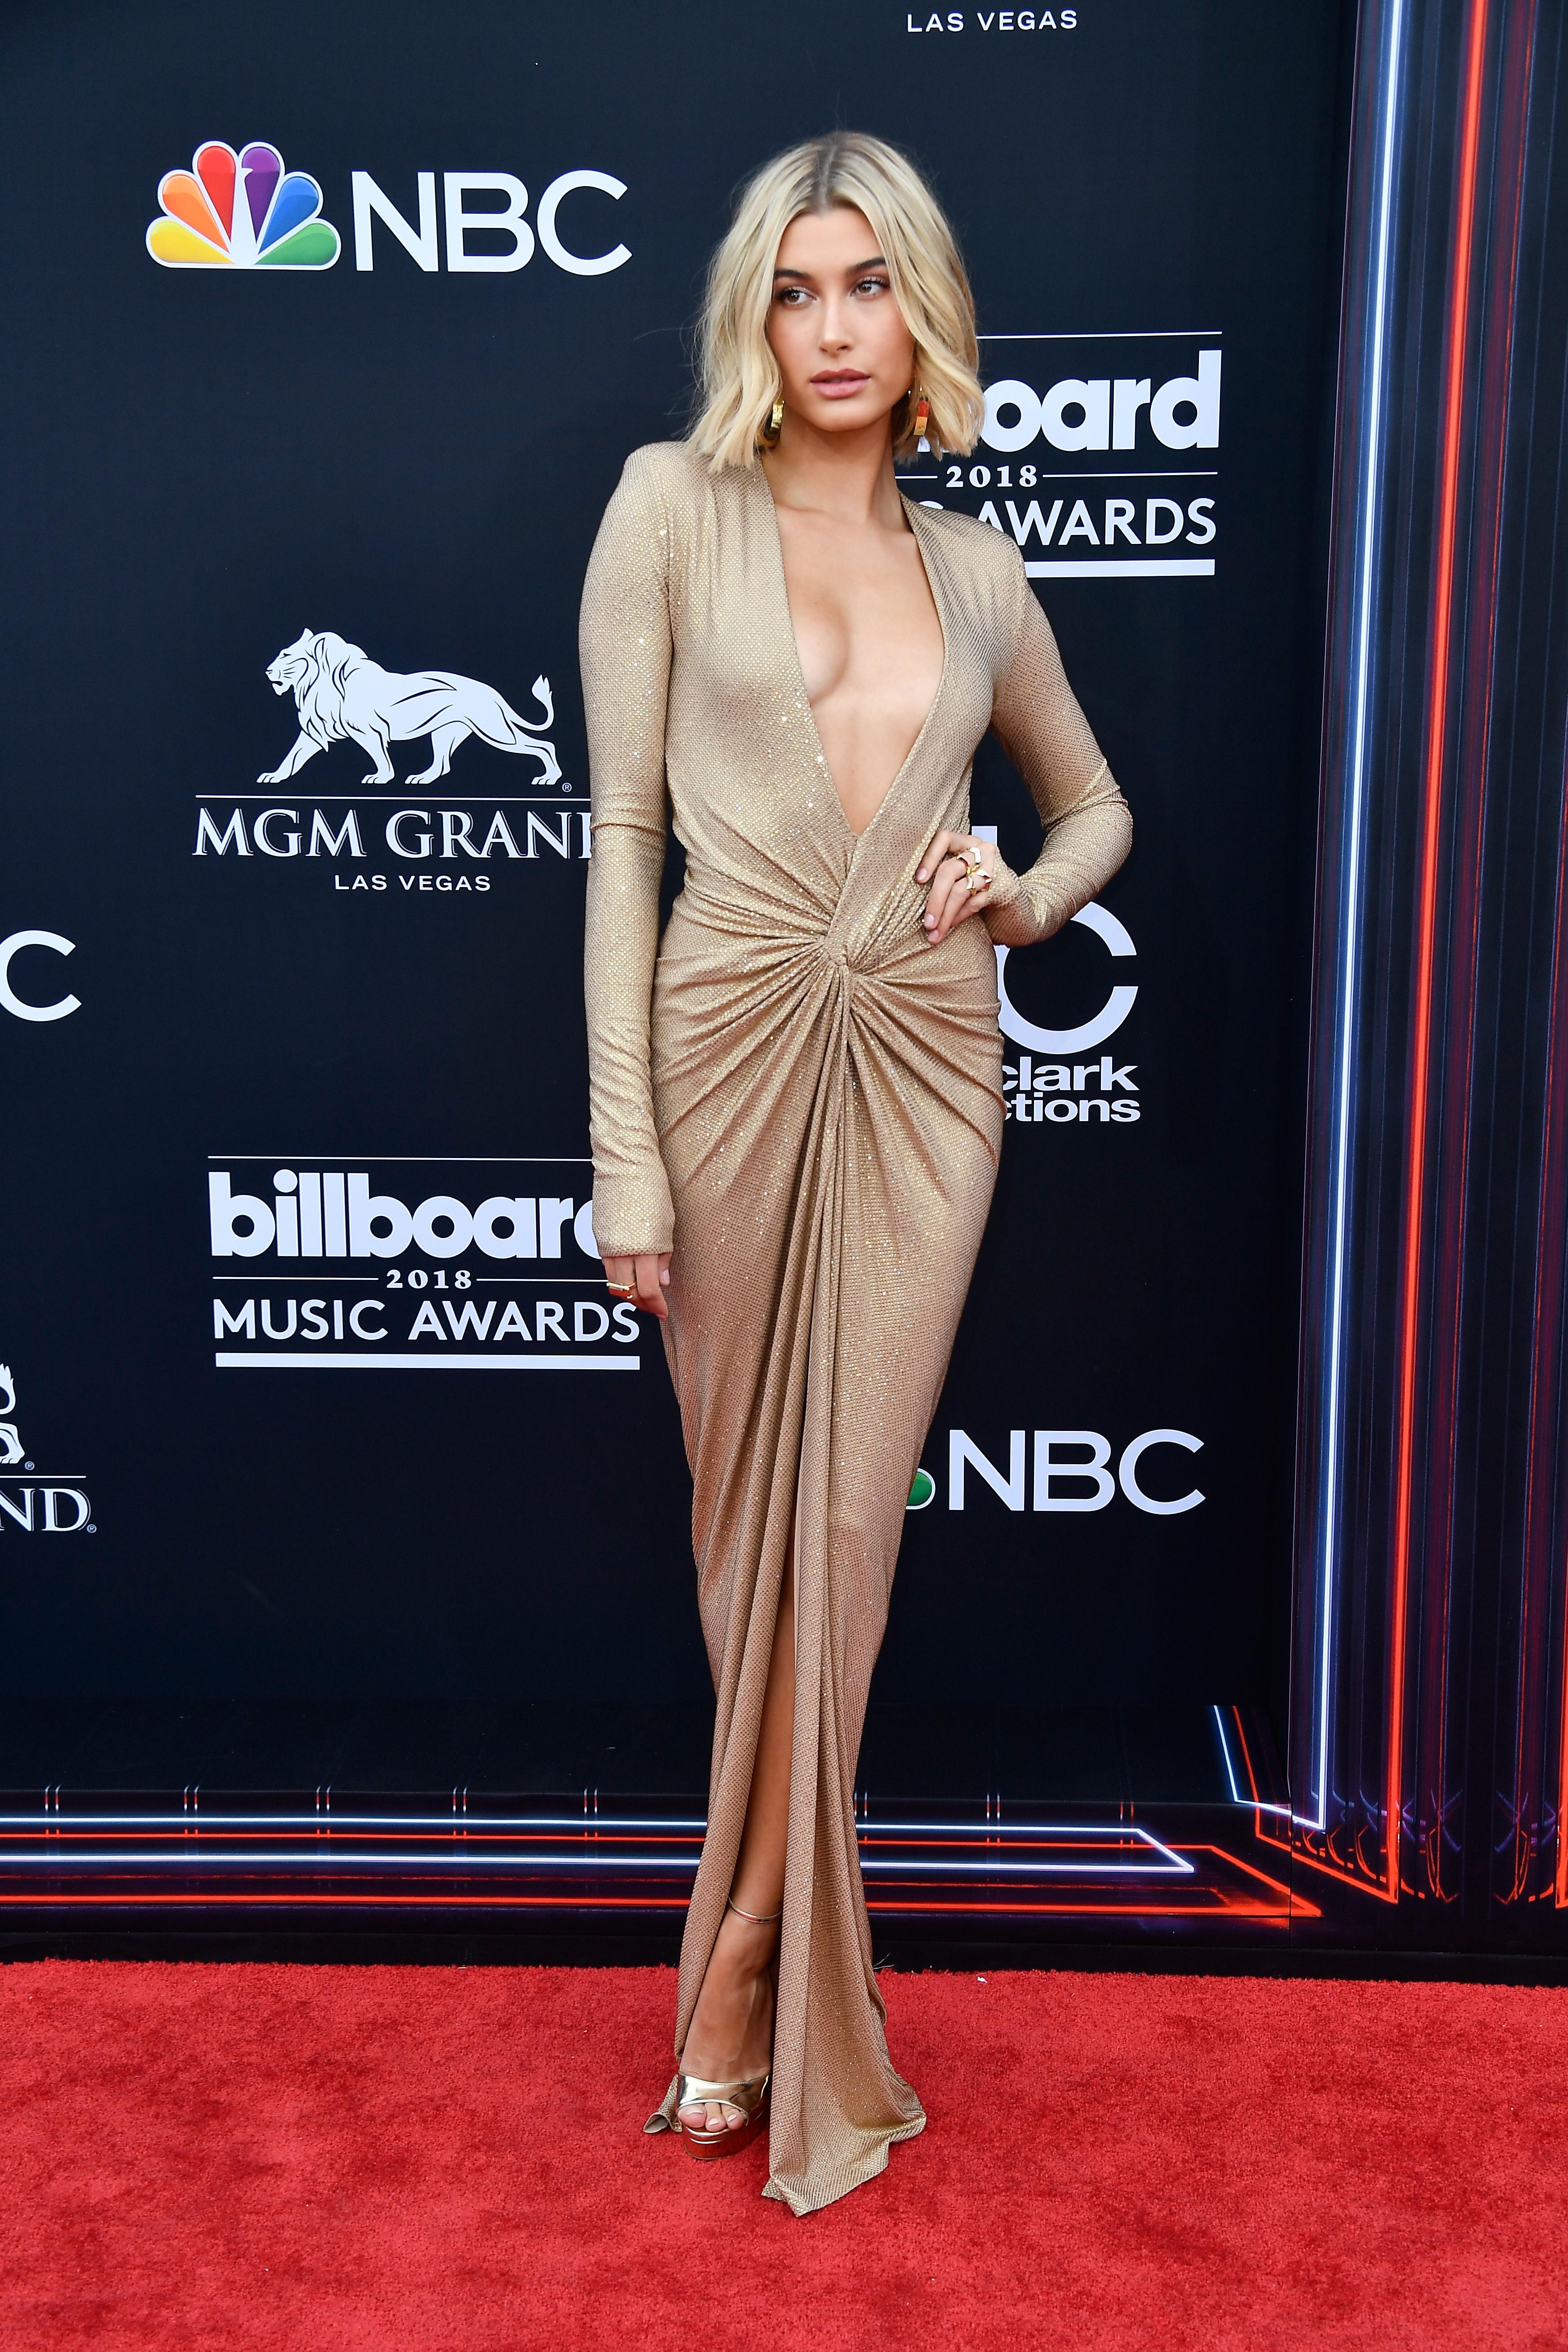 hailey-baldwin-look-2018-Billboard-Music-Awards